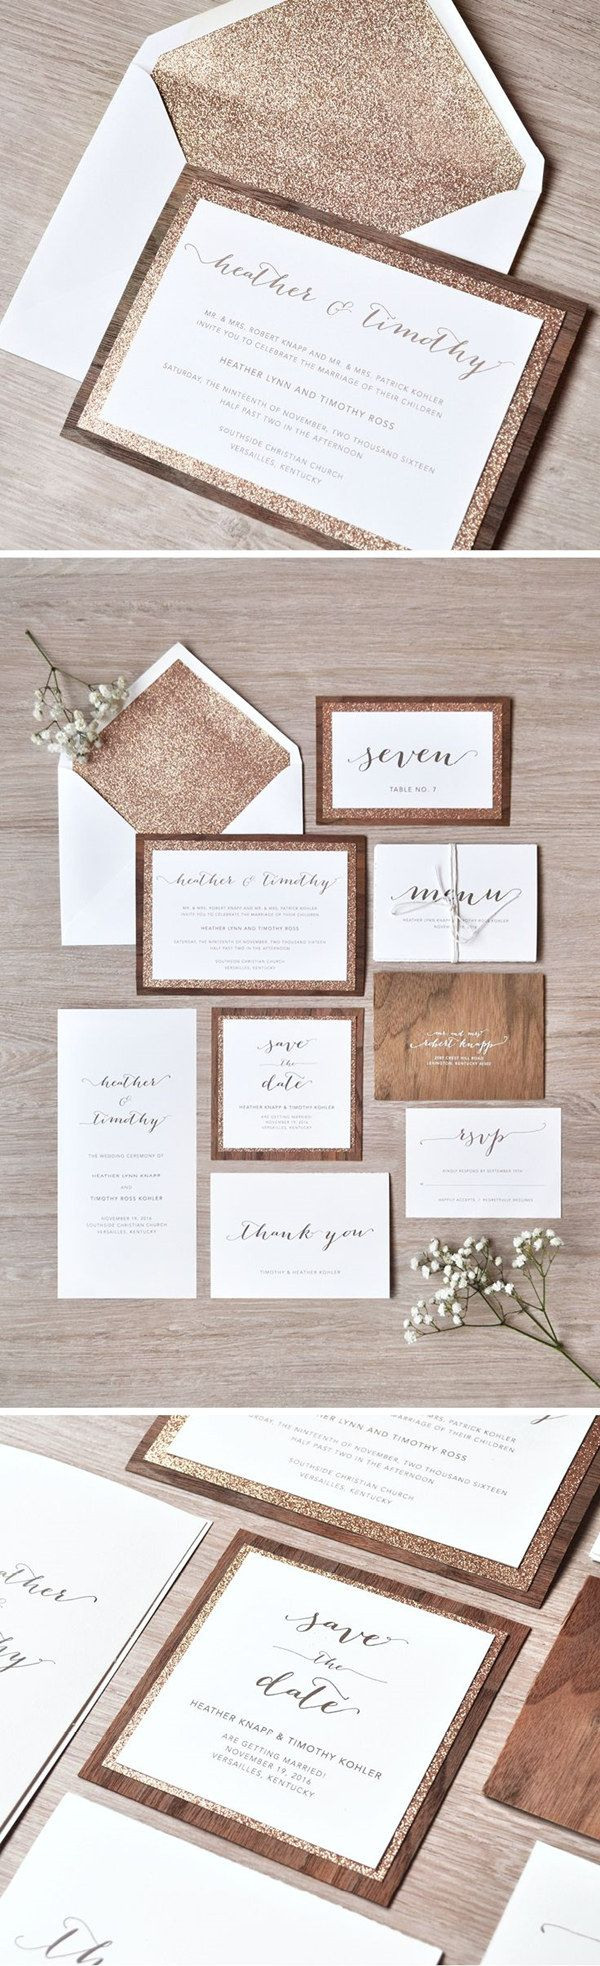 gold wedding invitations gold wedding invitations 10 Hottest Wedding Invitation Trends for